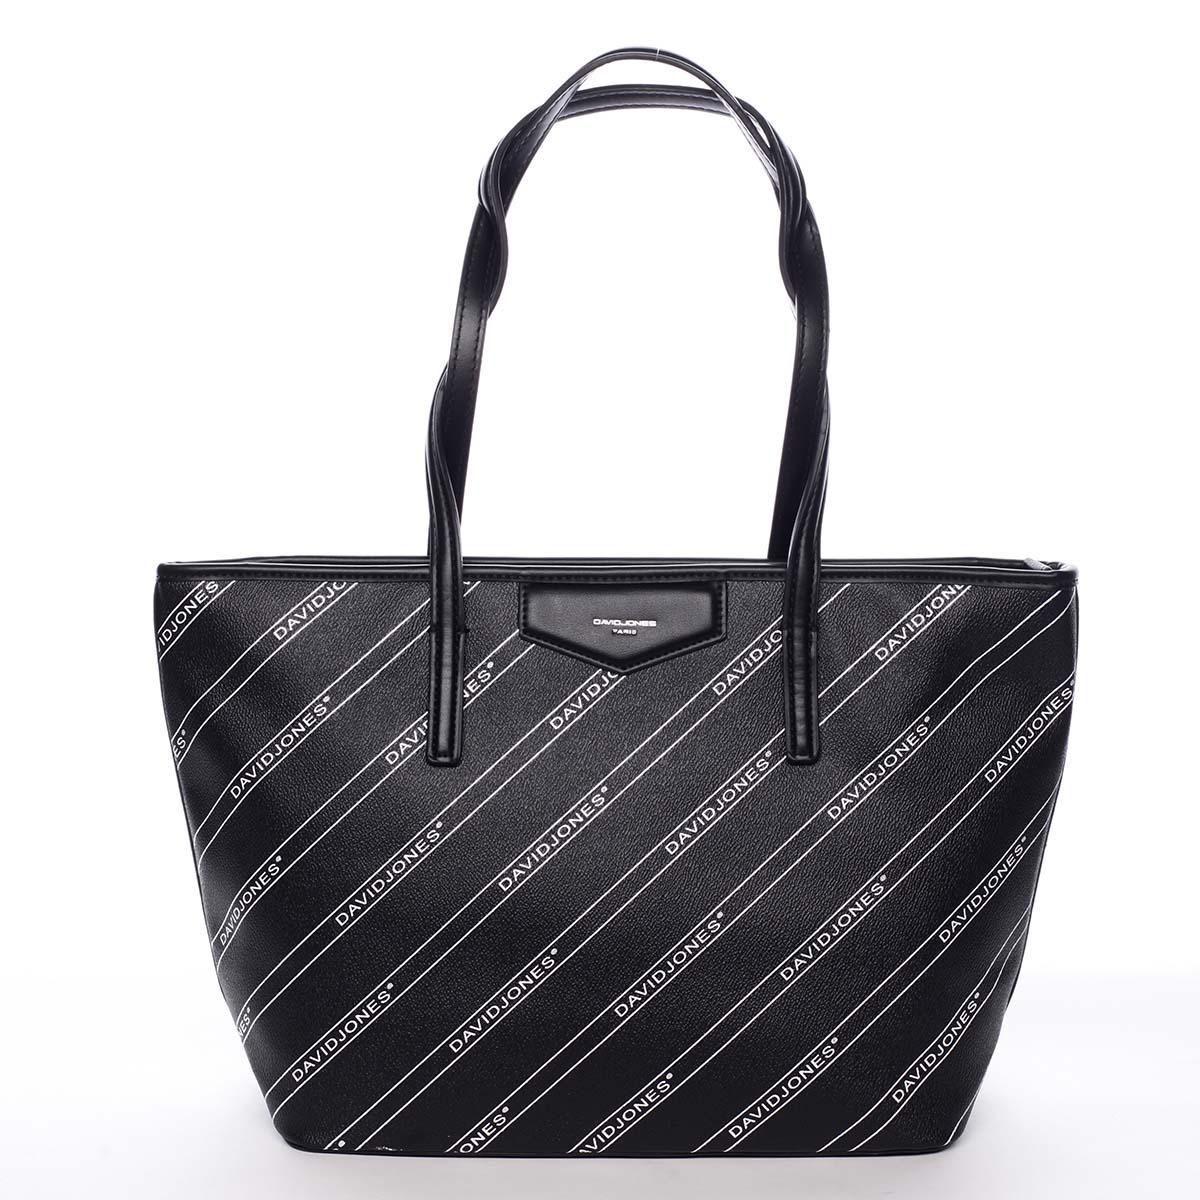 Veľká čierna moderná kabelka cez plece - David Jones Abisag